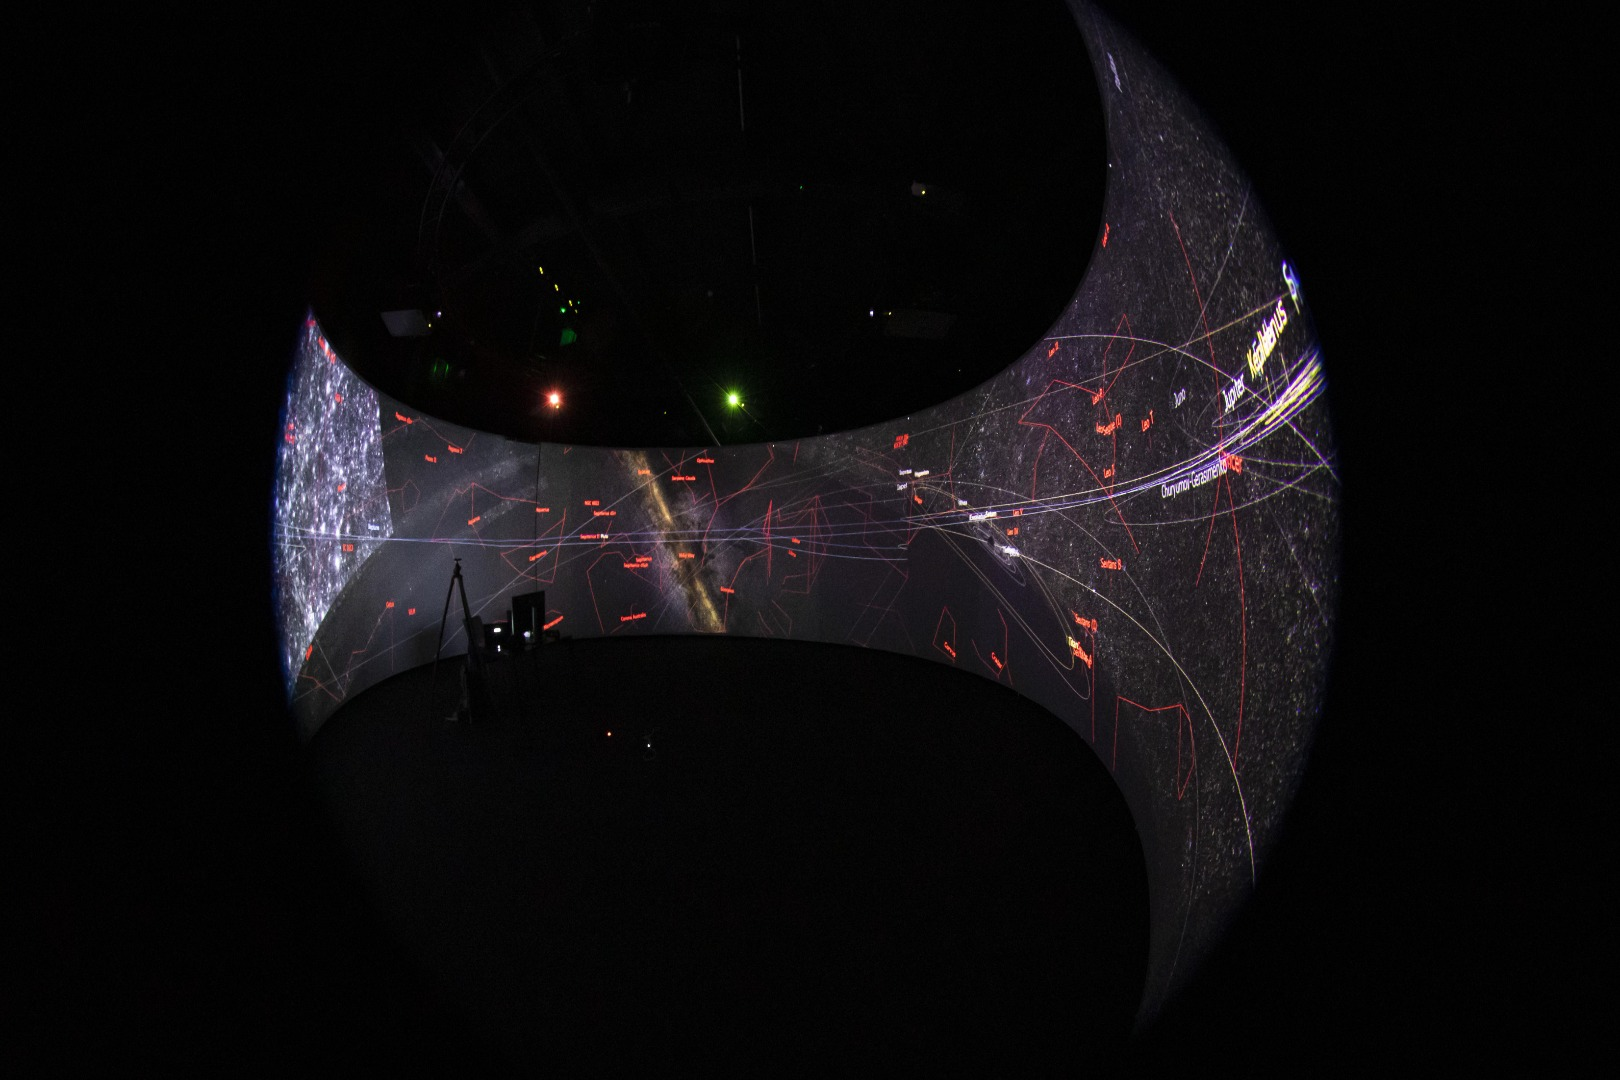 EPFL's Virtual Space Tour